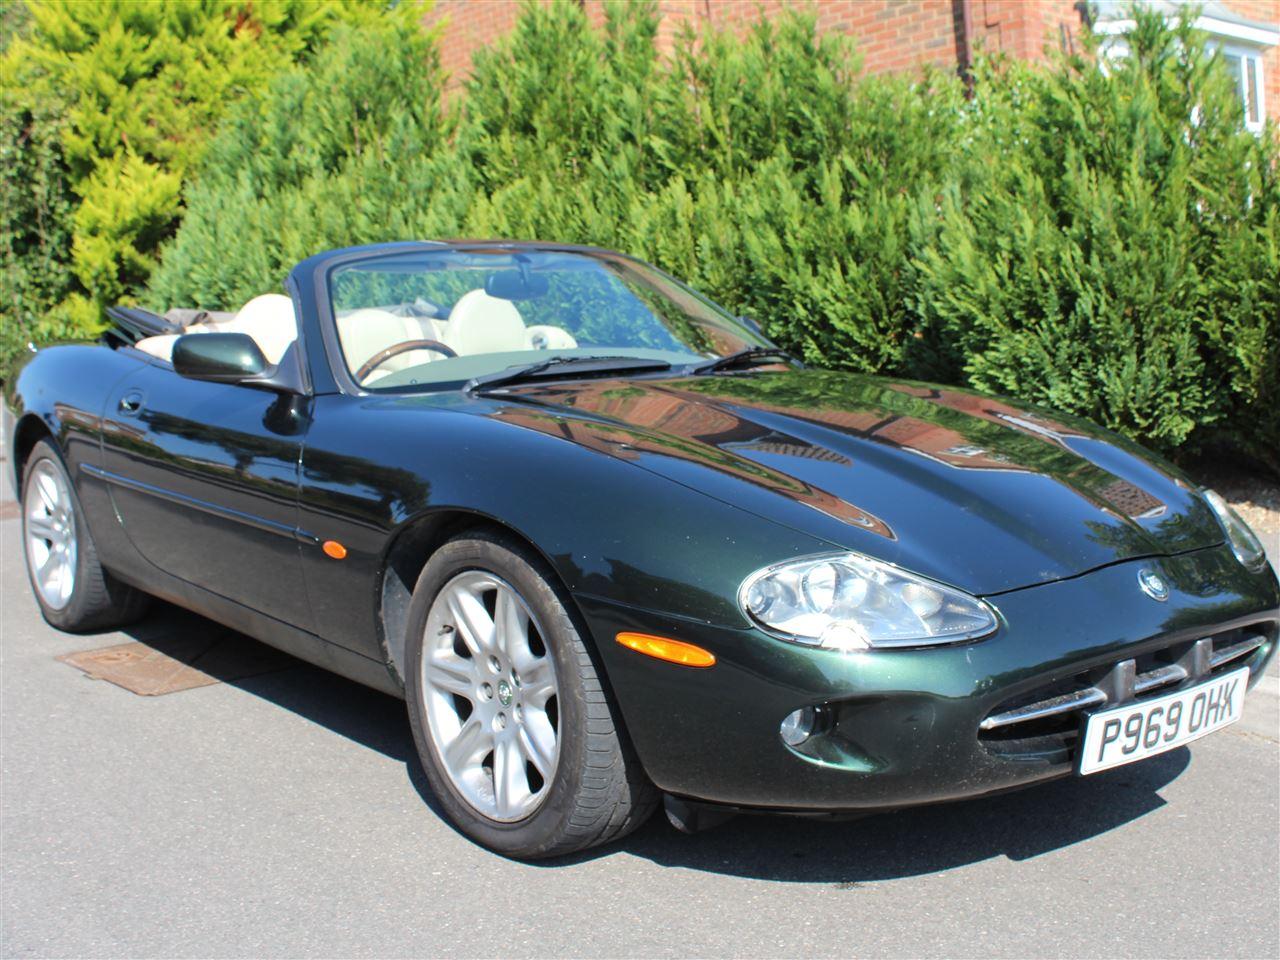 Jaguar Heritage Clic And Sports Cars 15 Sep 2018 1997 Xk8 Convertible